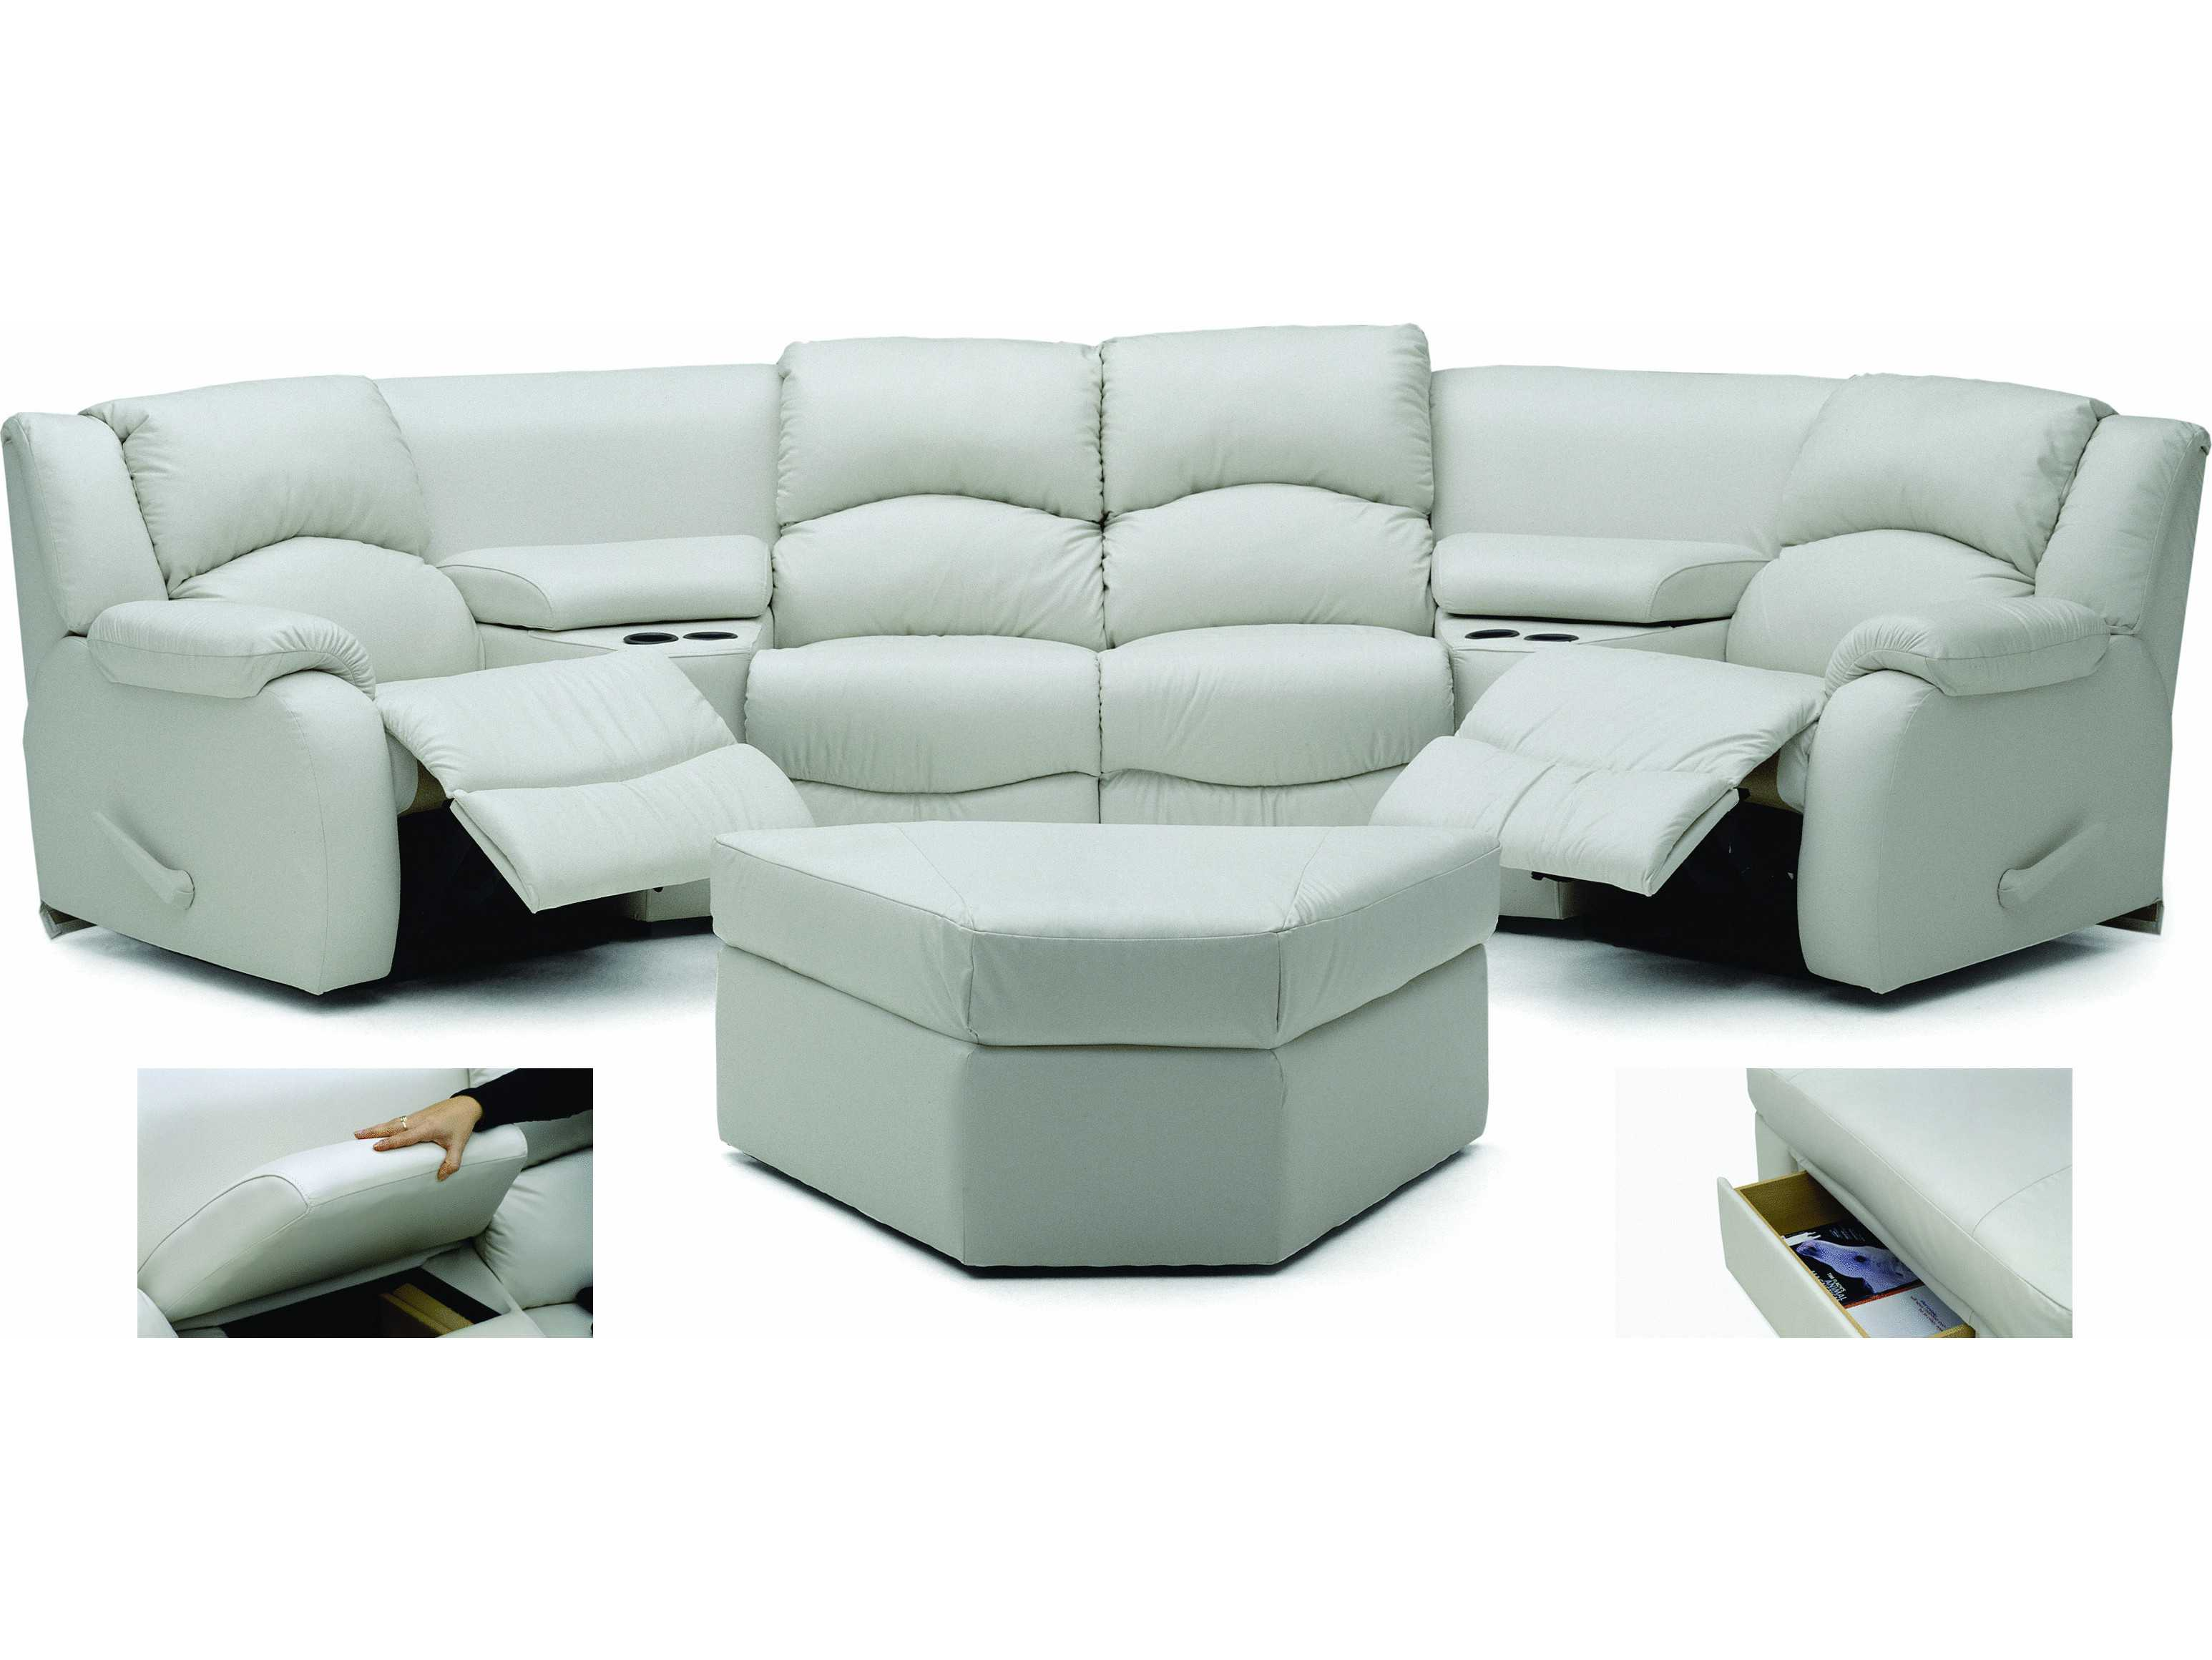 Palliser Dane Motion Home Theater Sectional Sofa 41066 Mo11